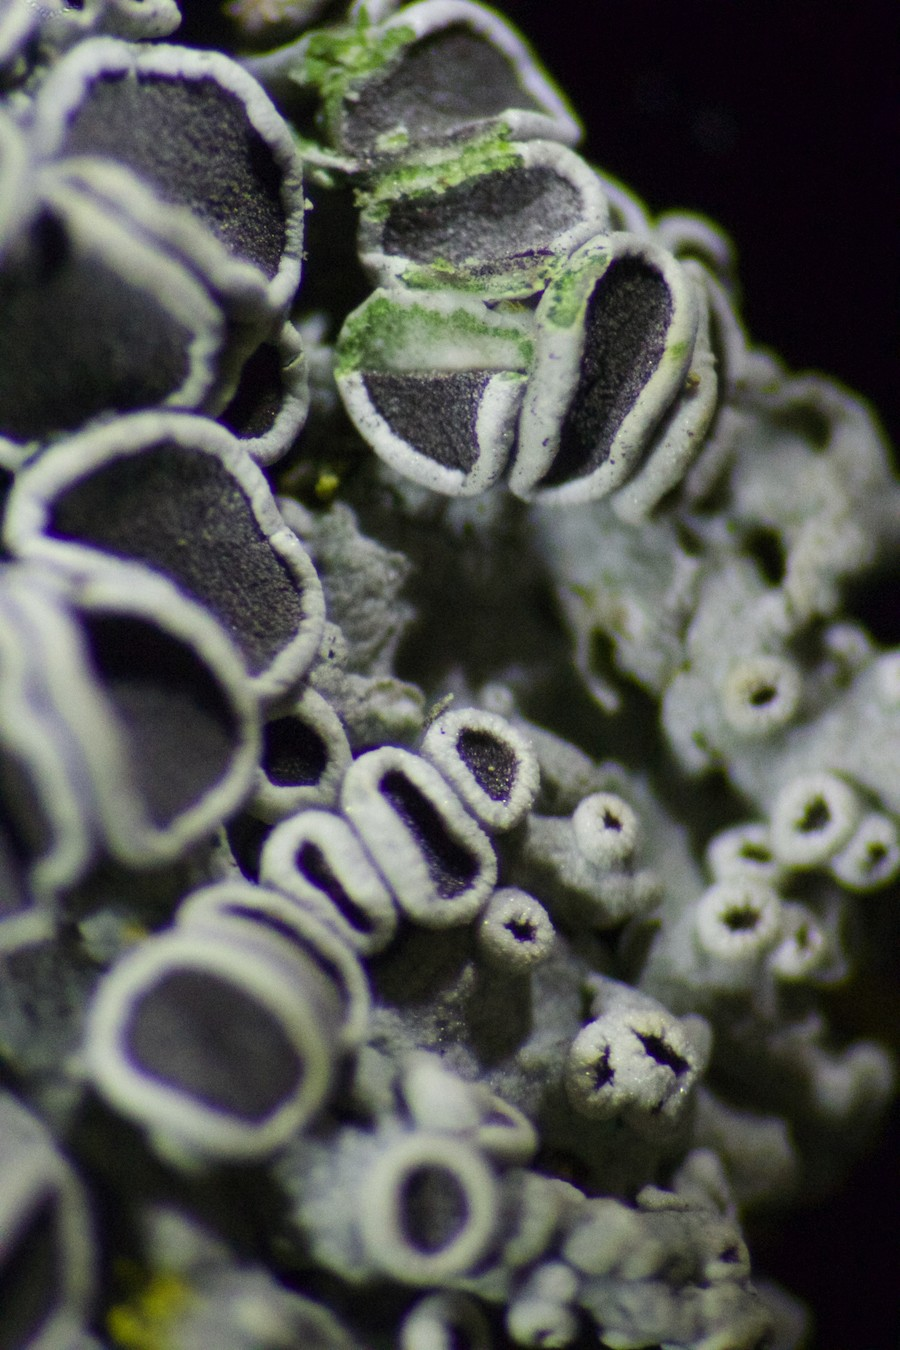 Lichen - ANDREW SCARPELLI